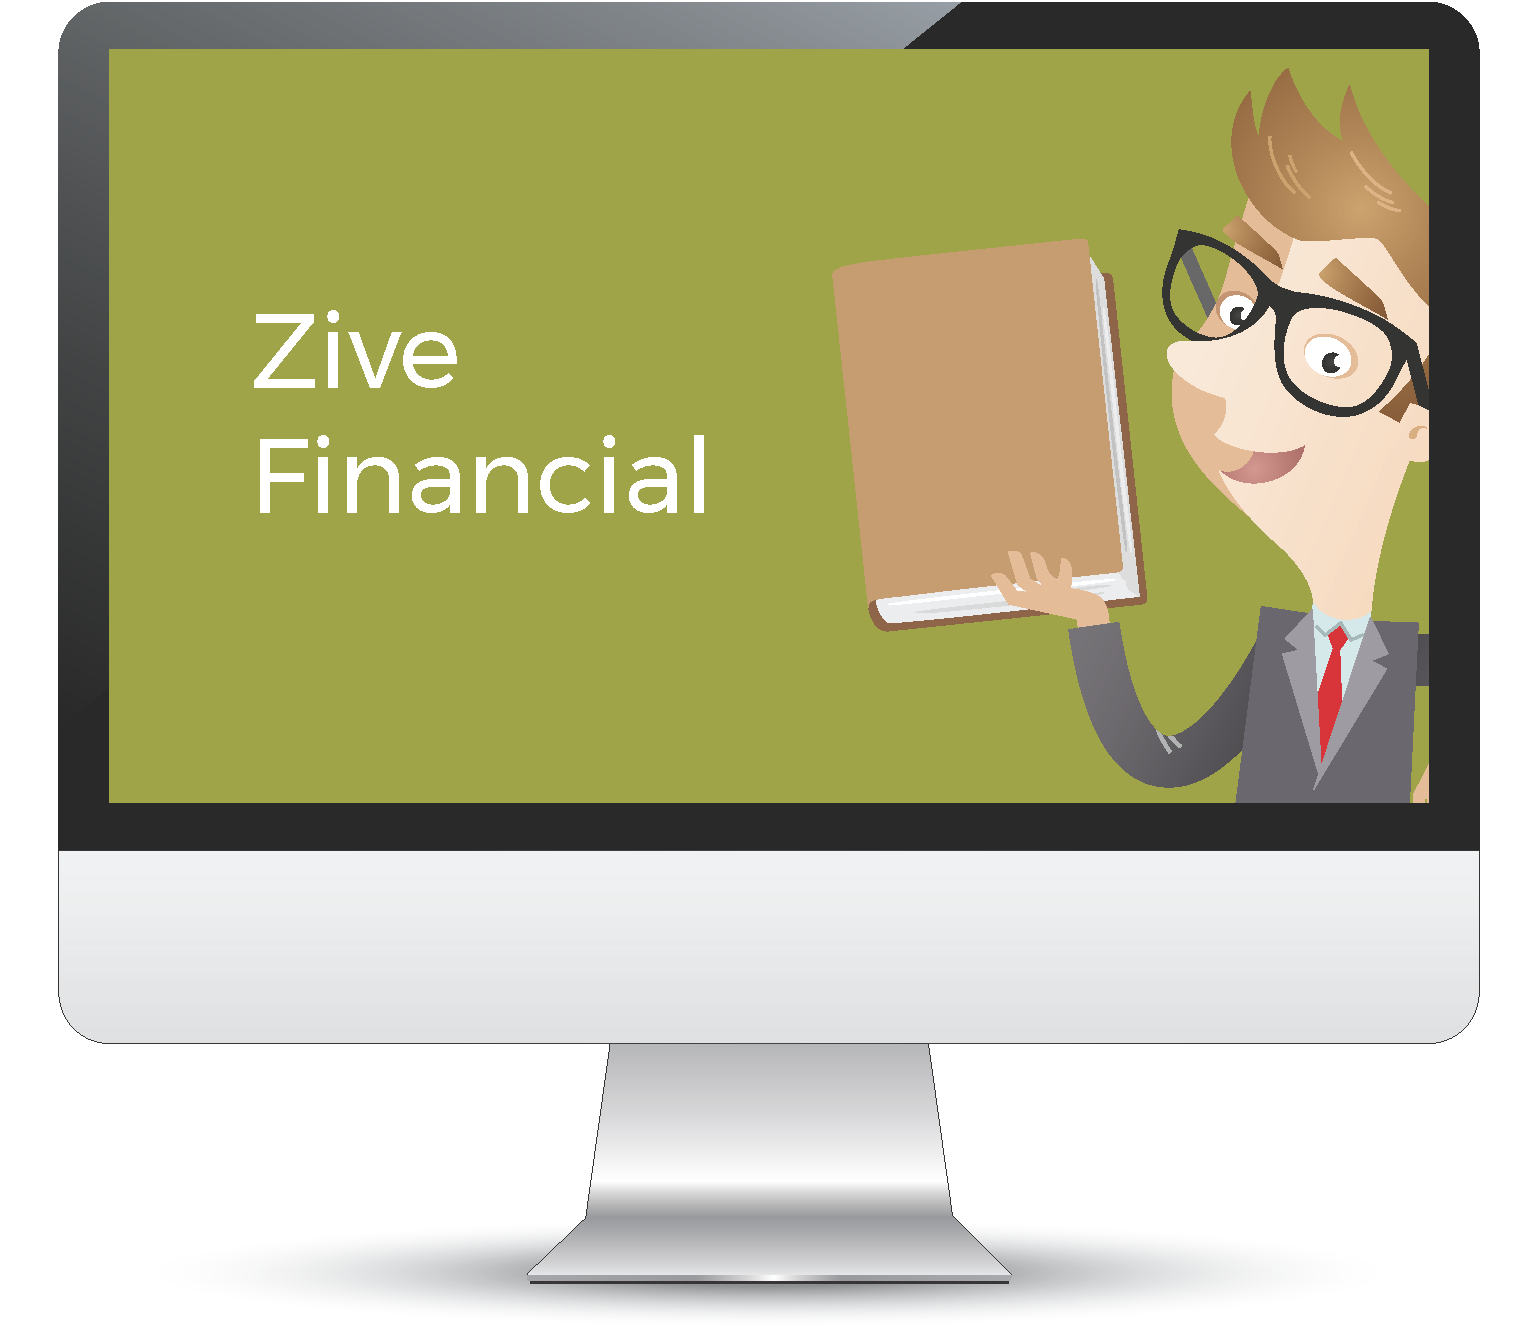 Document management case study financial